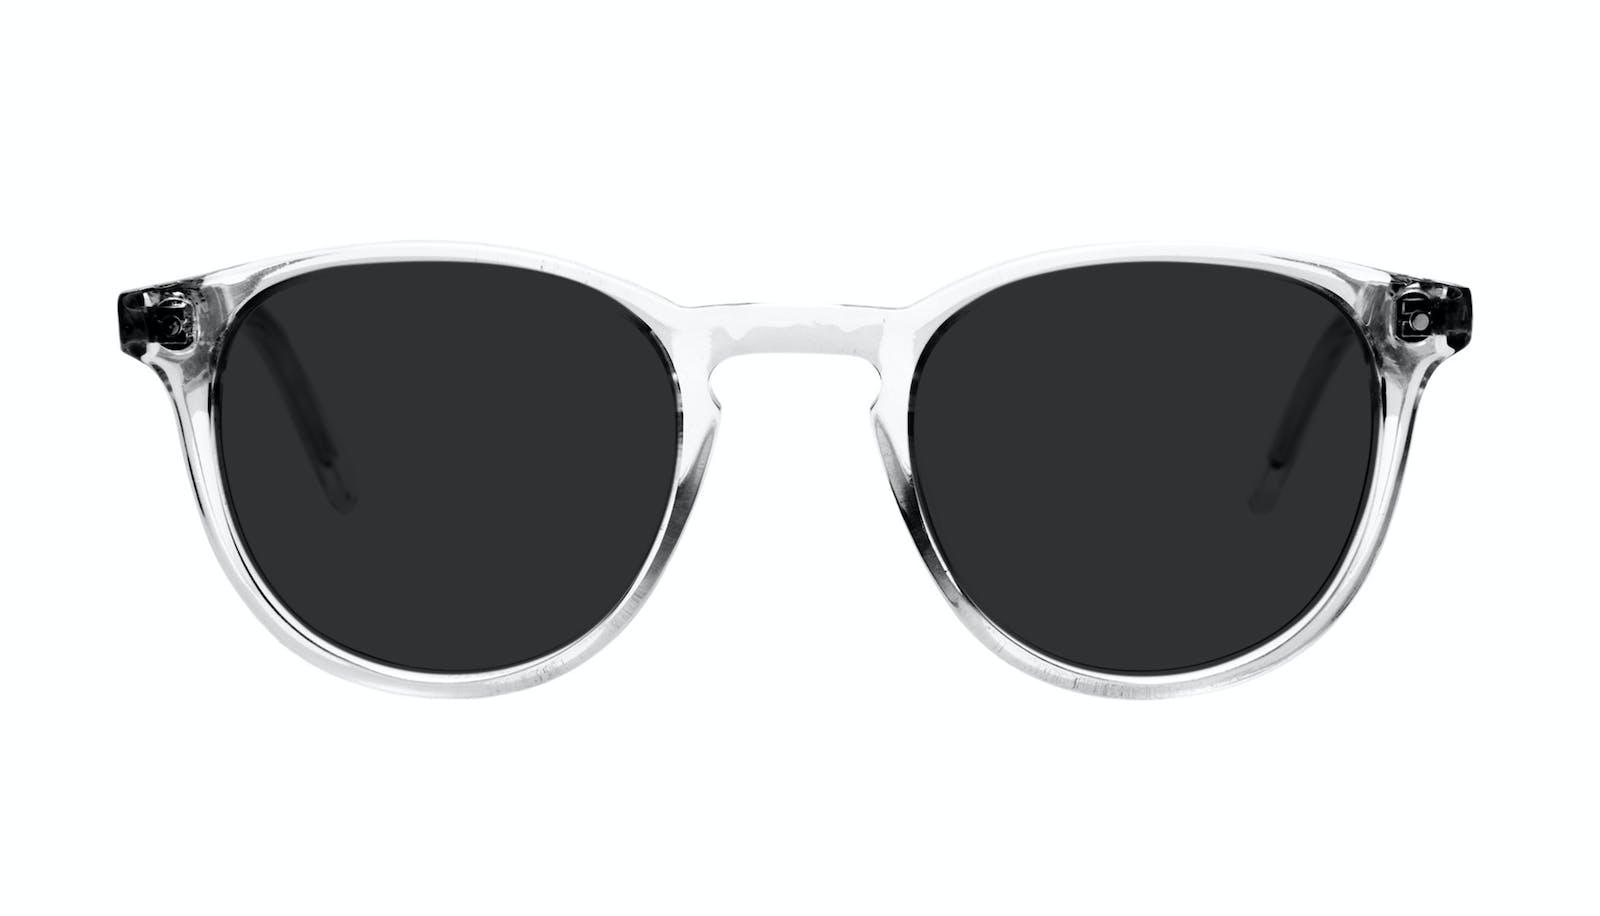 fd9ca3815a1 Affordable Fashion Glasses Round Sunglasses Men Cult Diamond